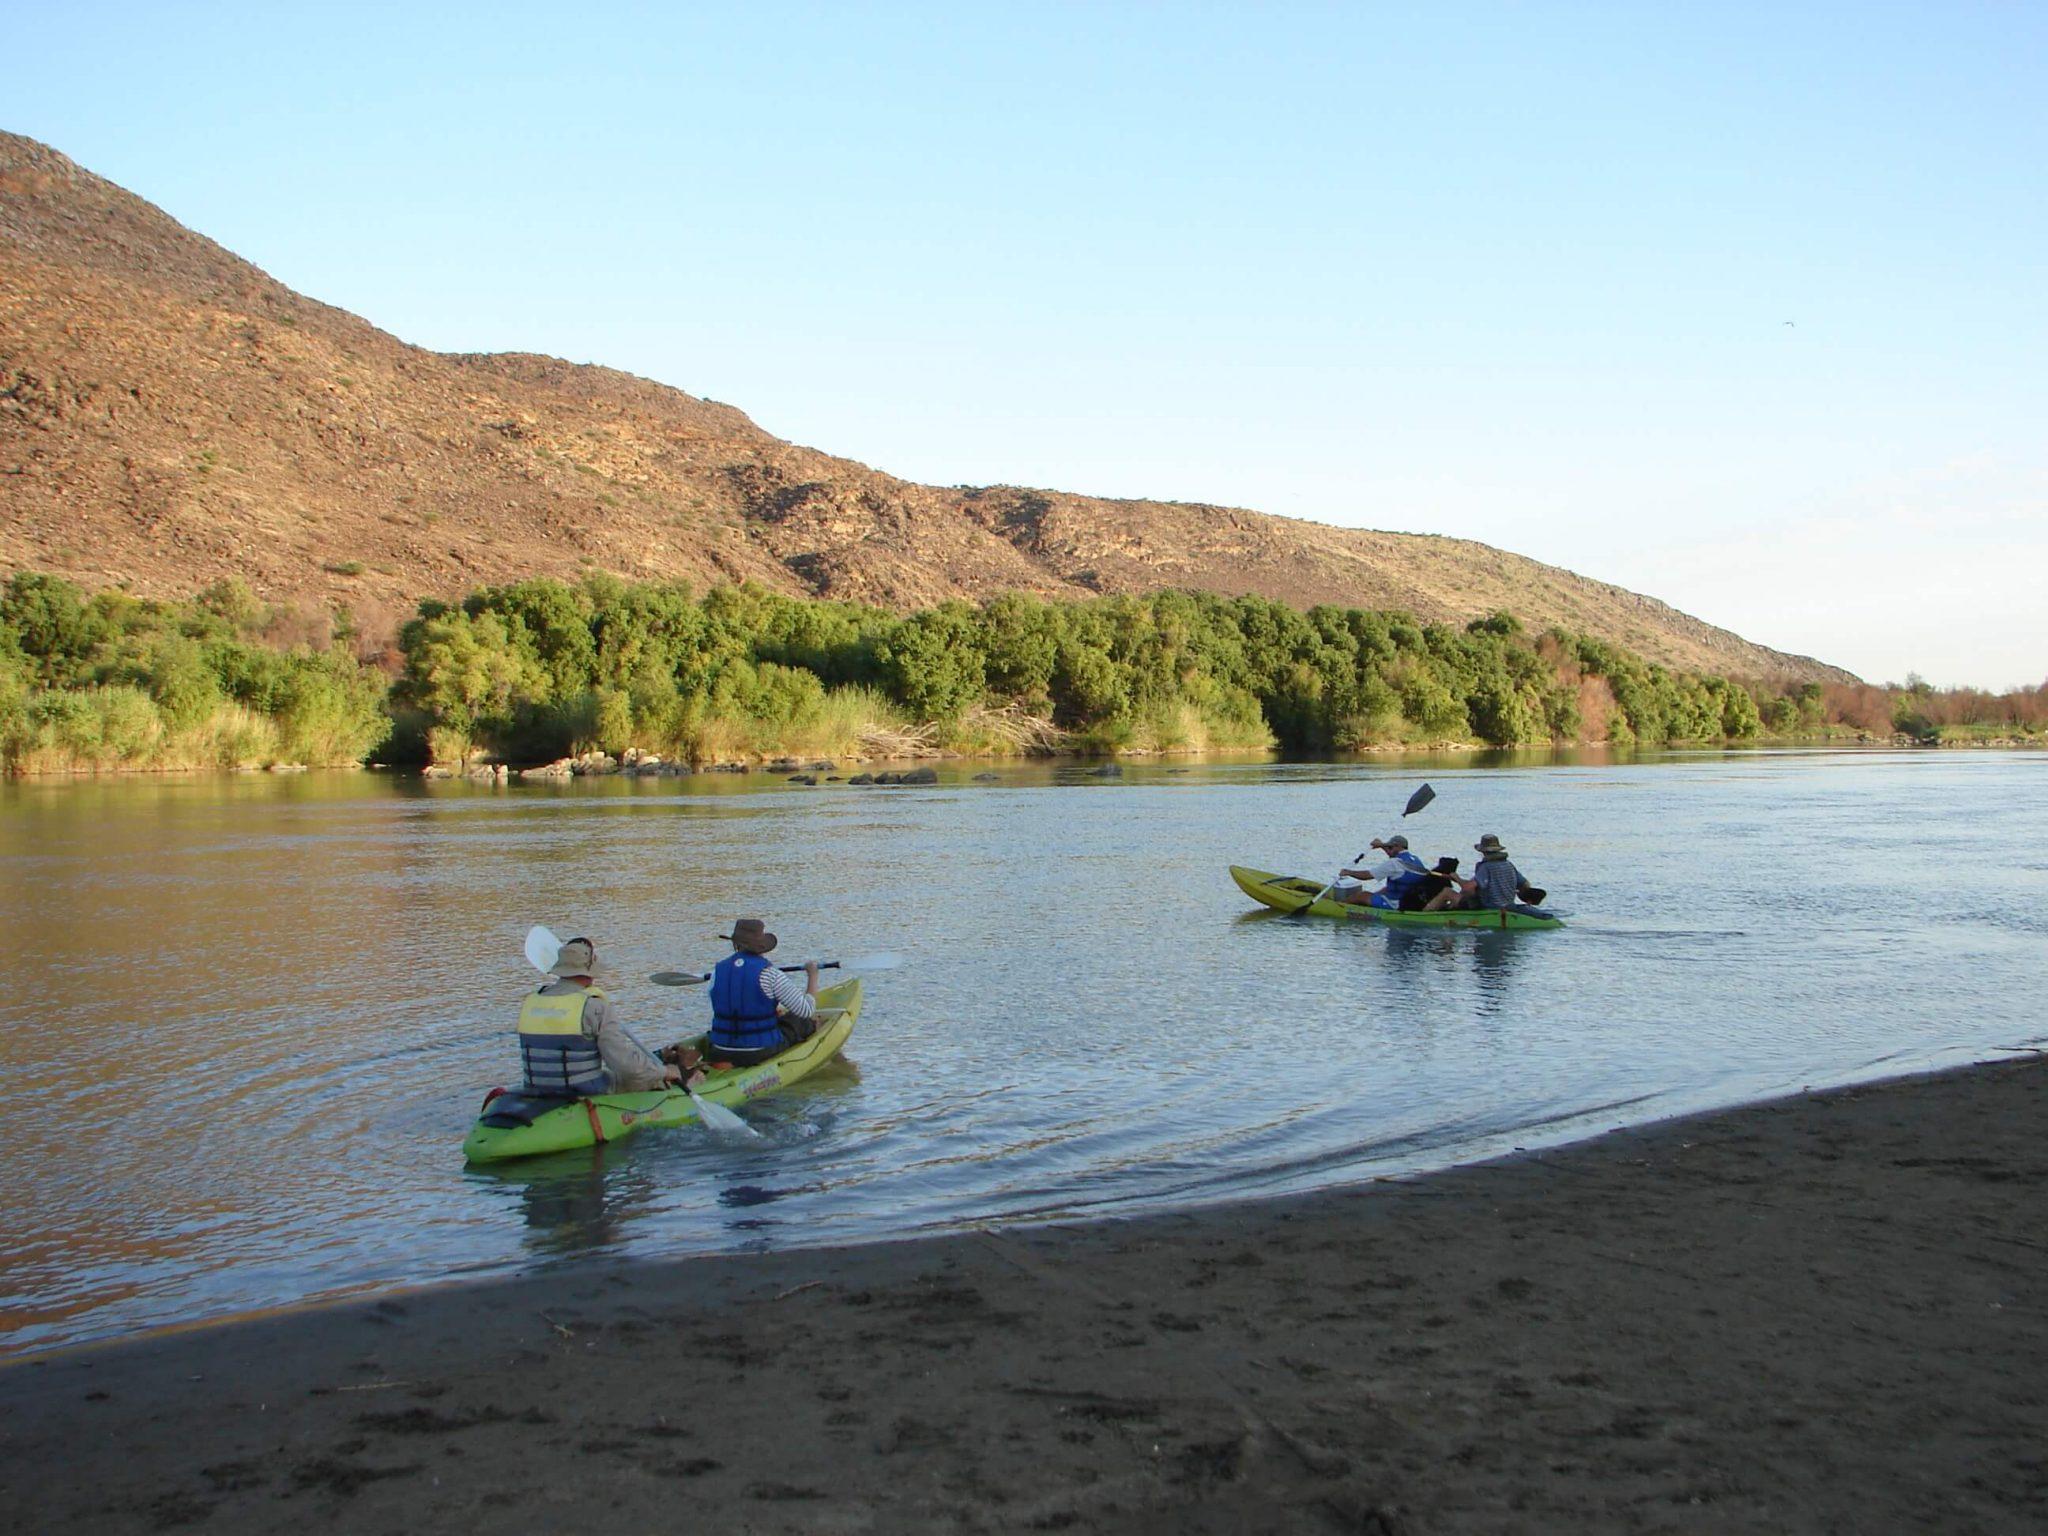 Orange River Hunting & Safari's